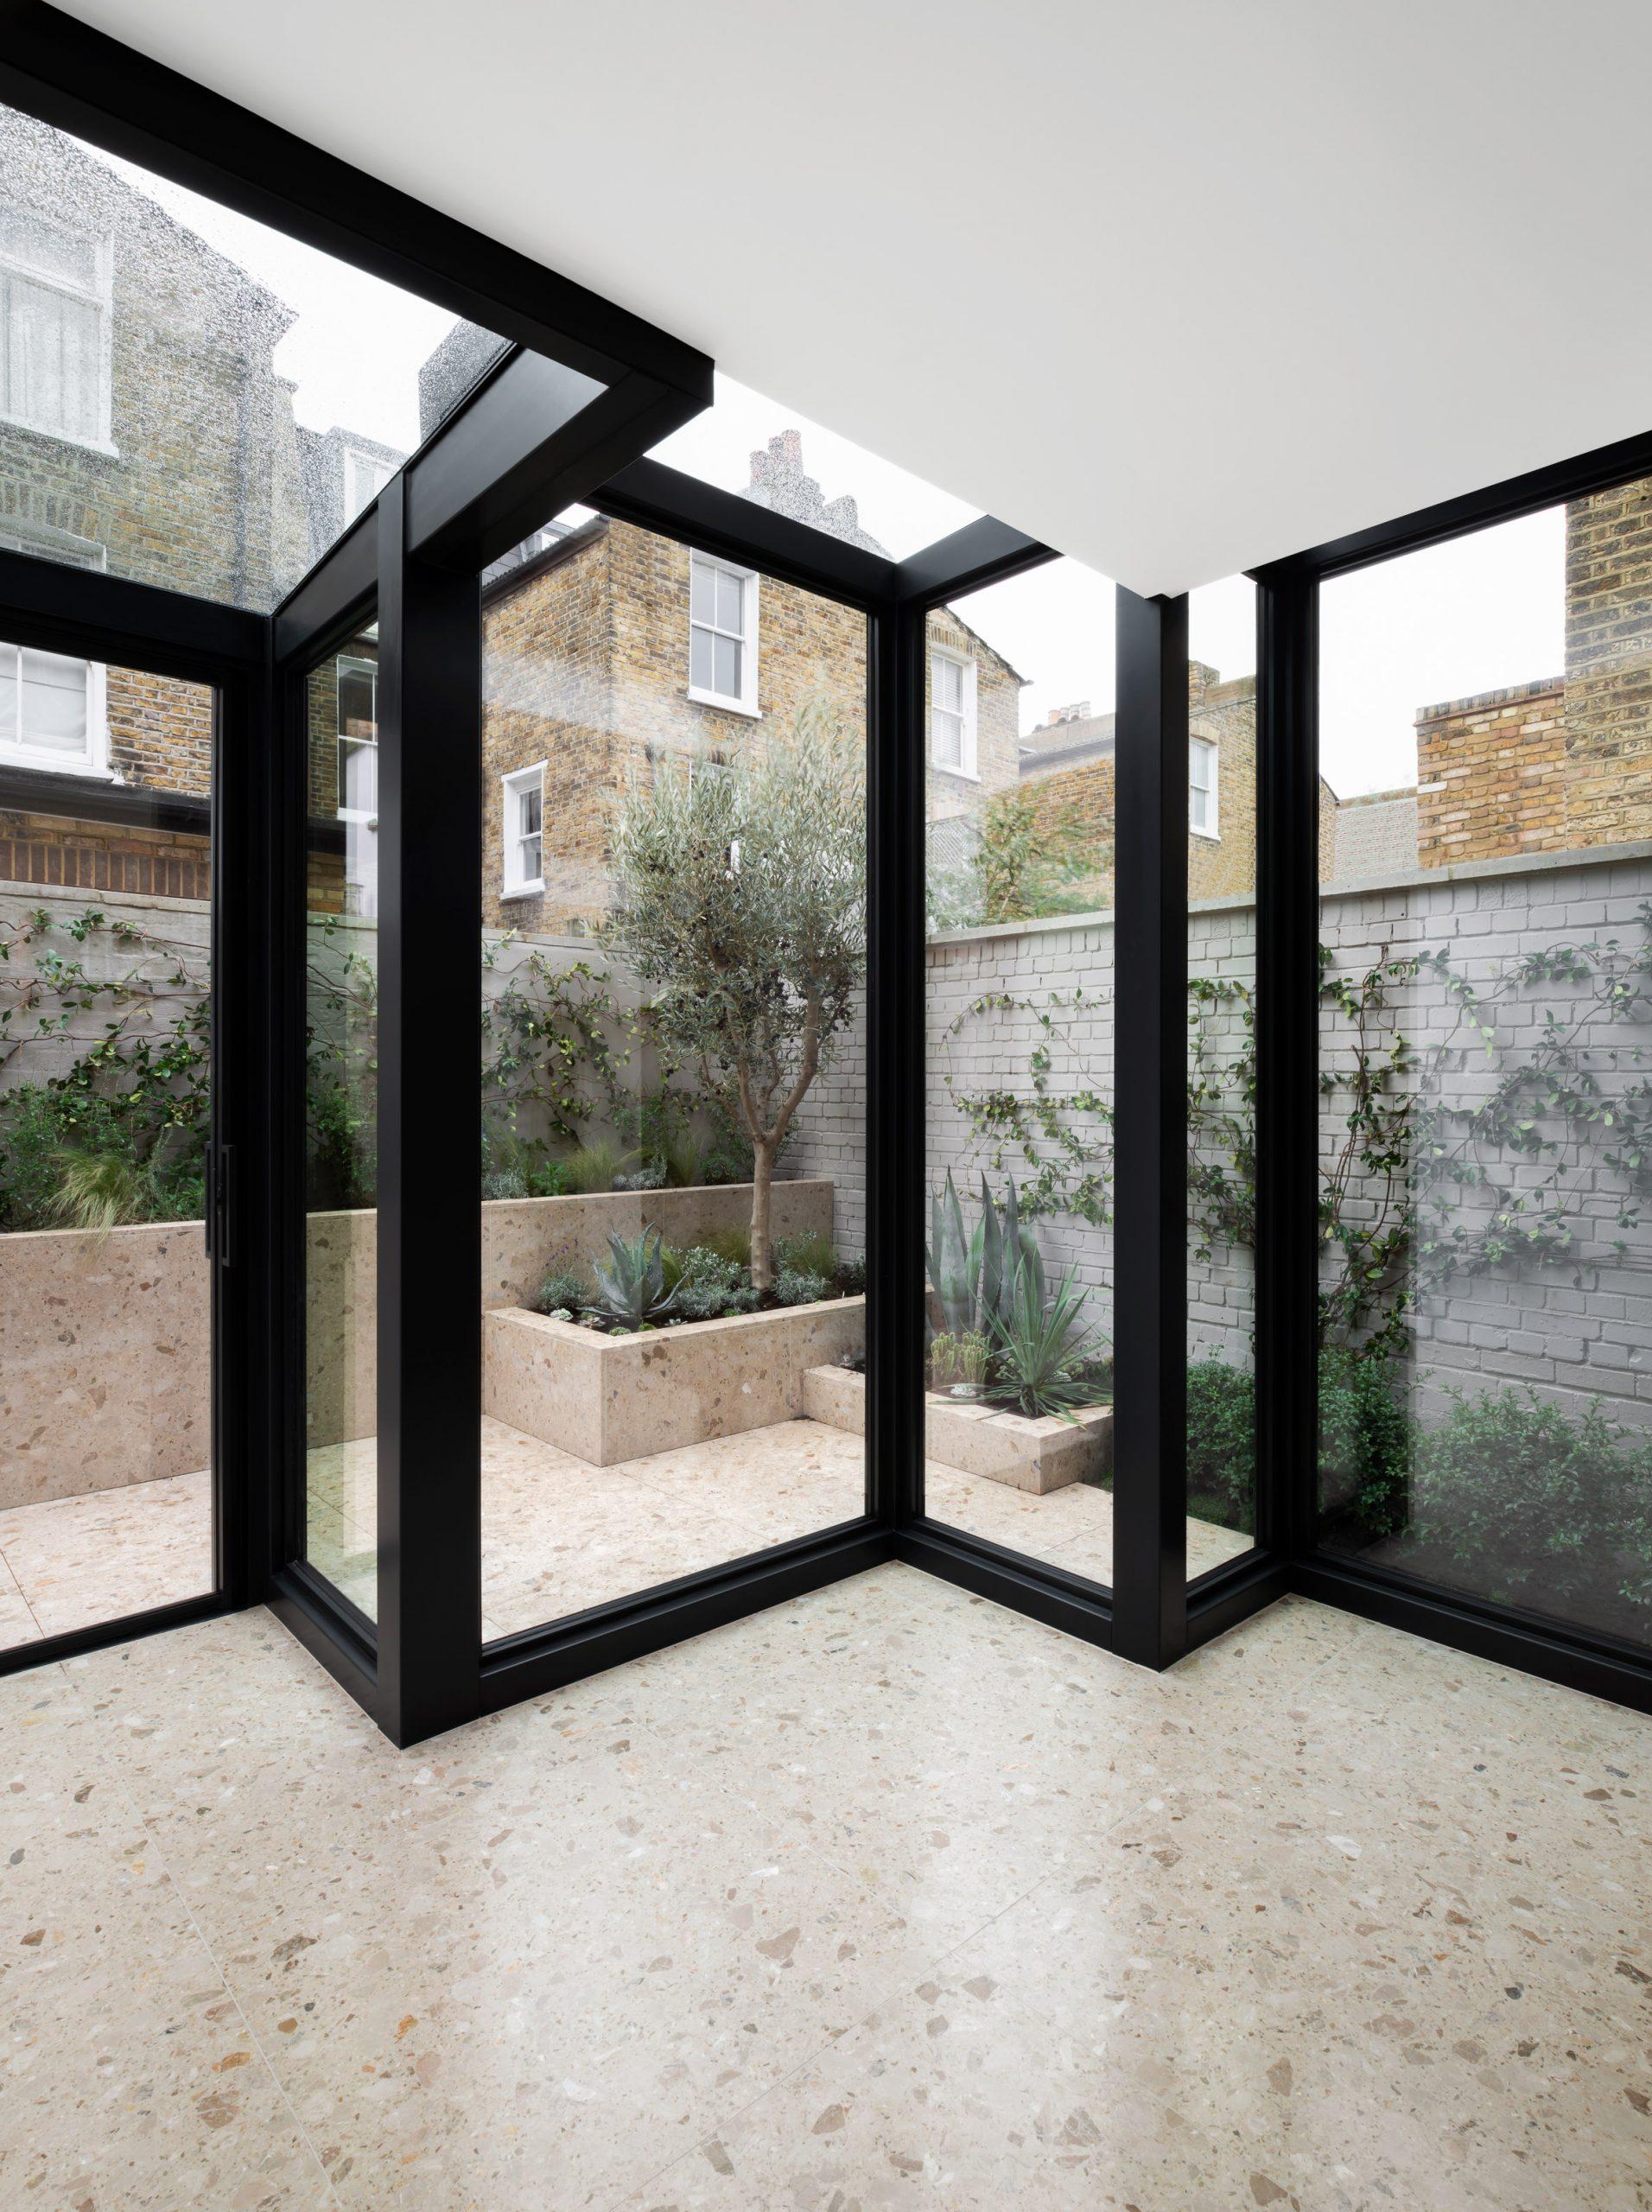 Glazed extension in Frame House by Bureau de Change